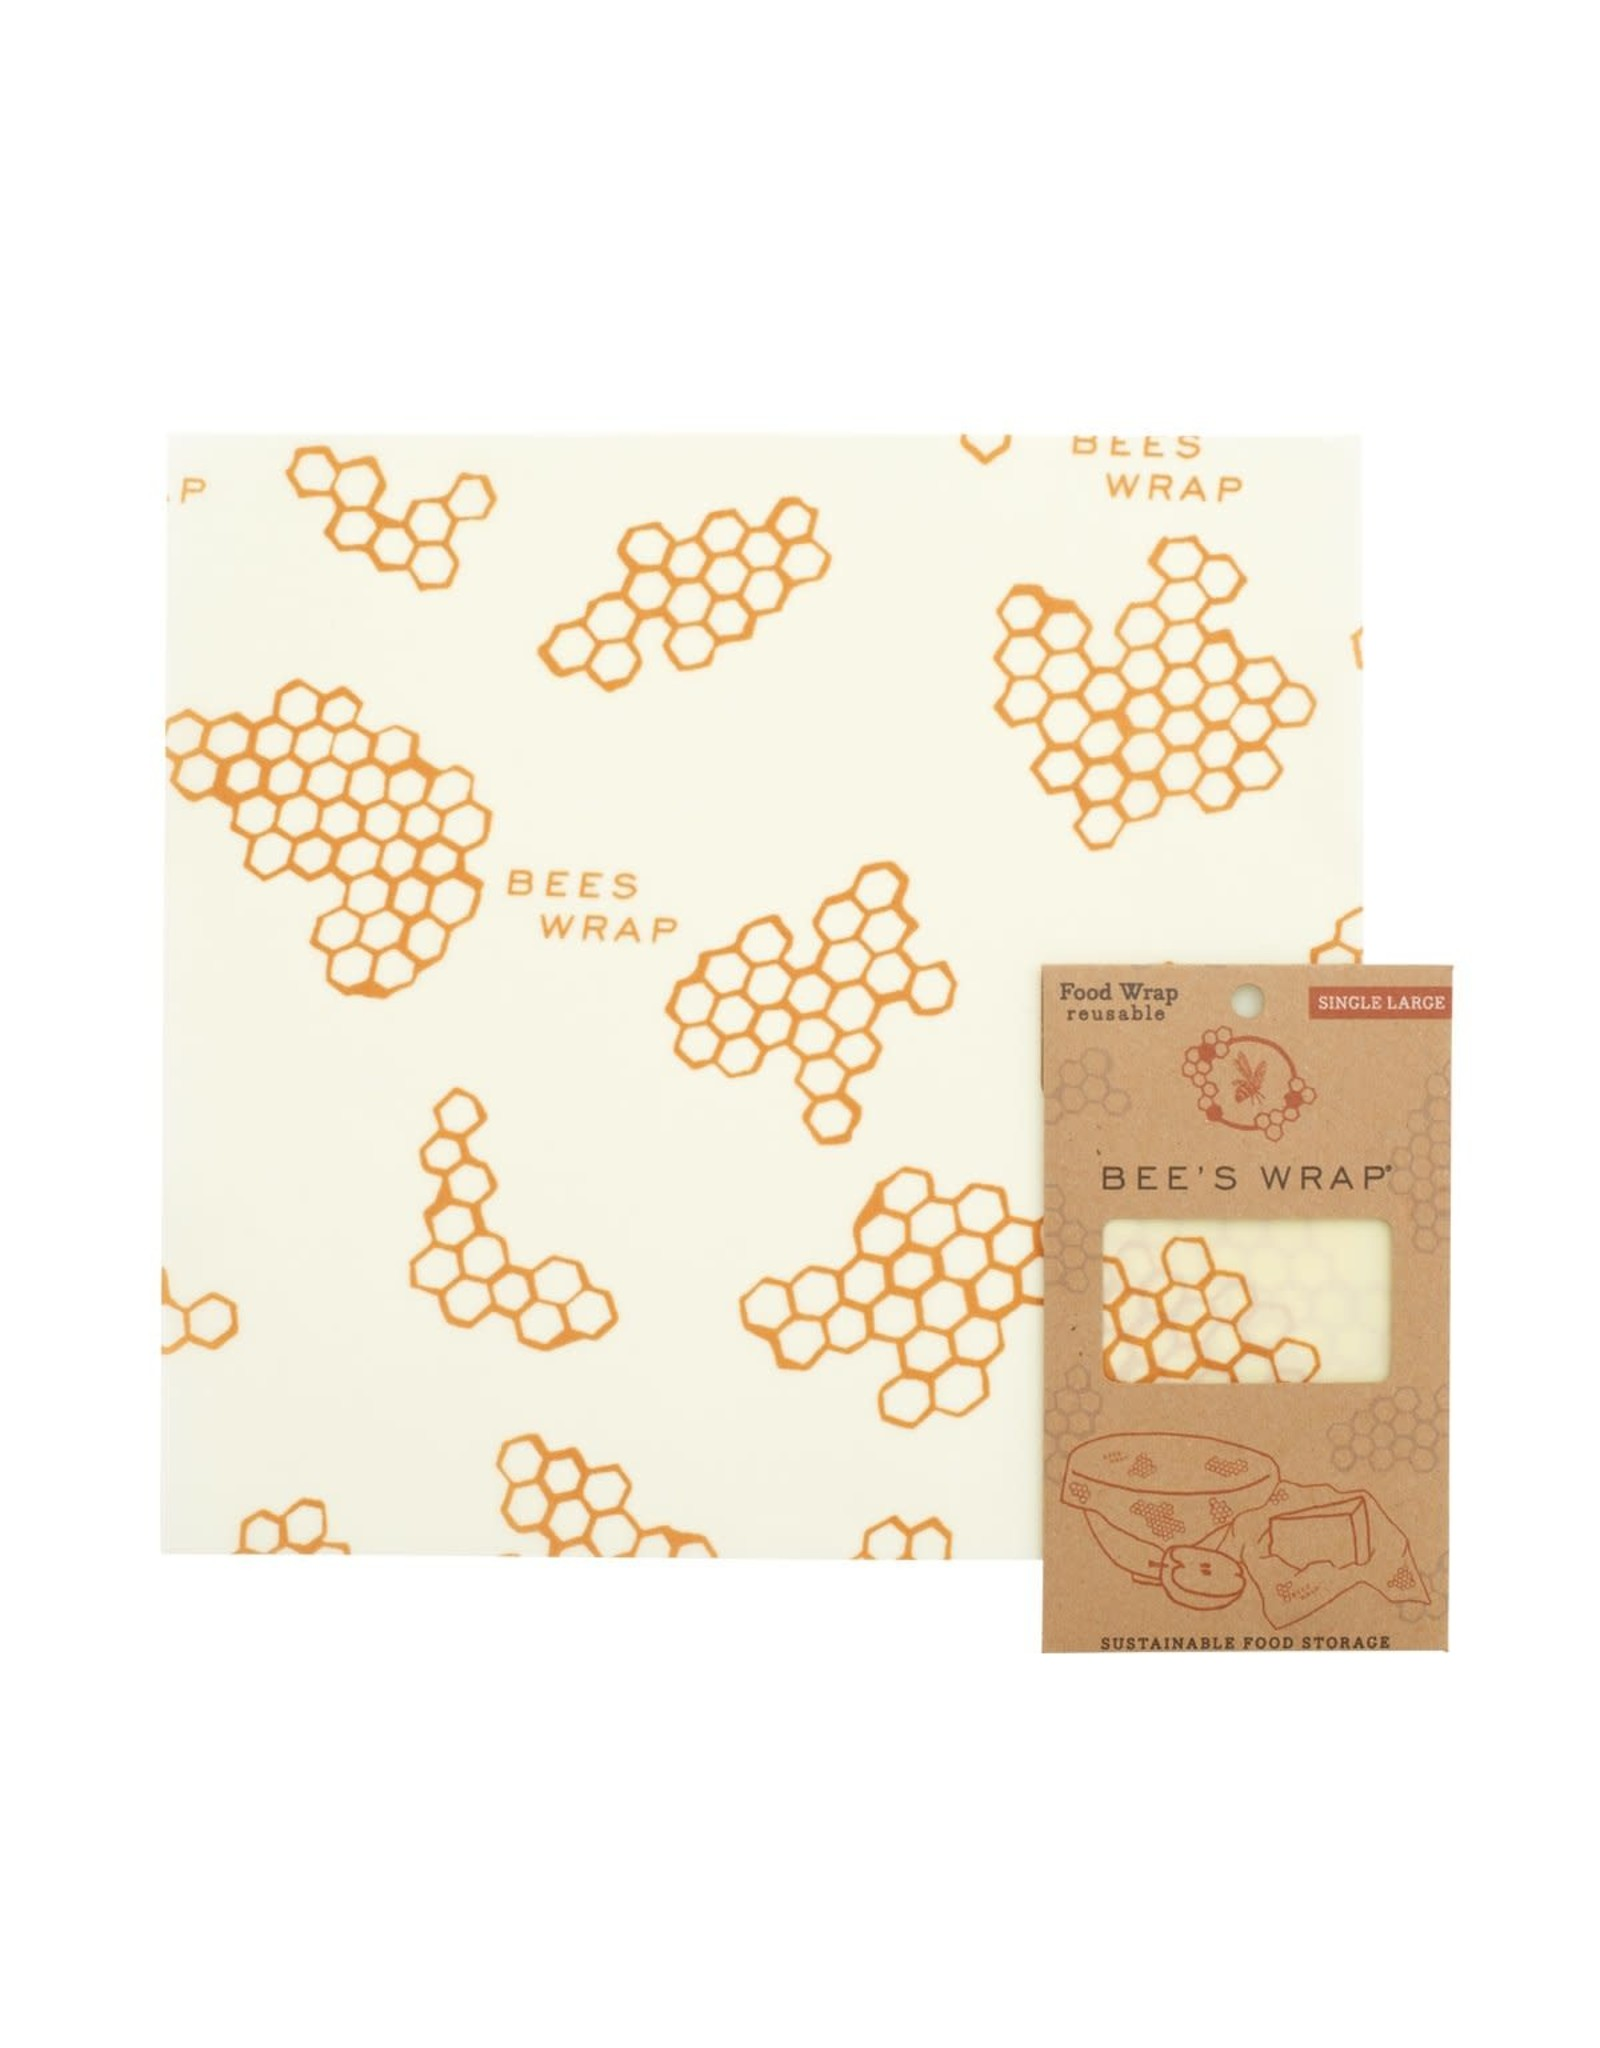 Bees Wrap Single Large Wrap - Honeycomb